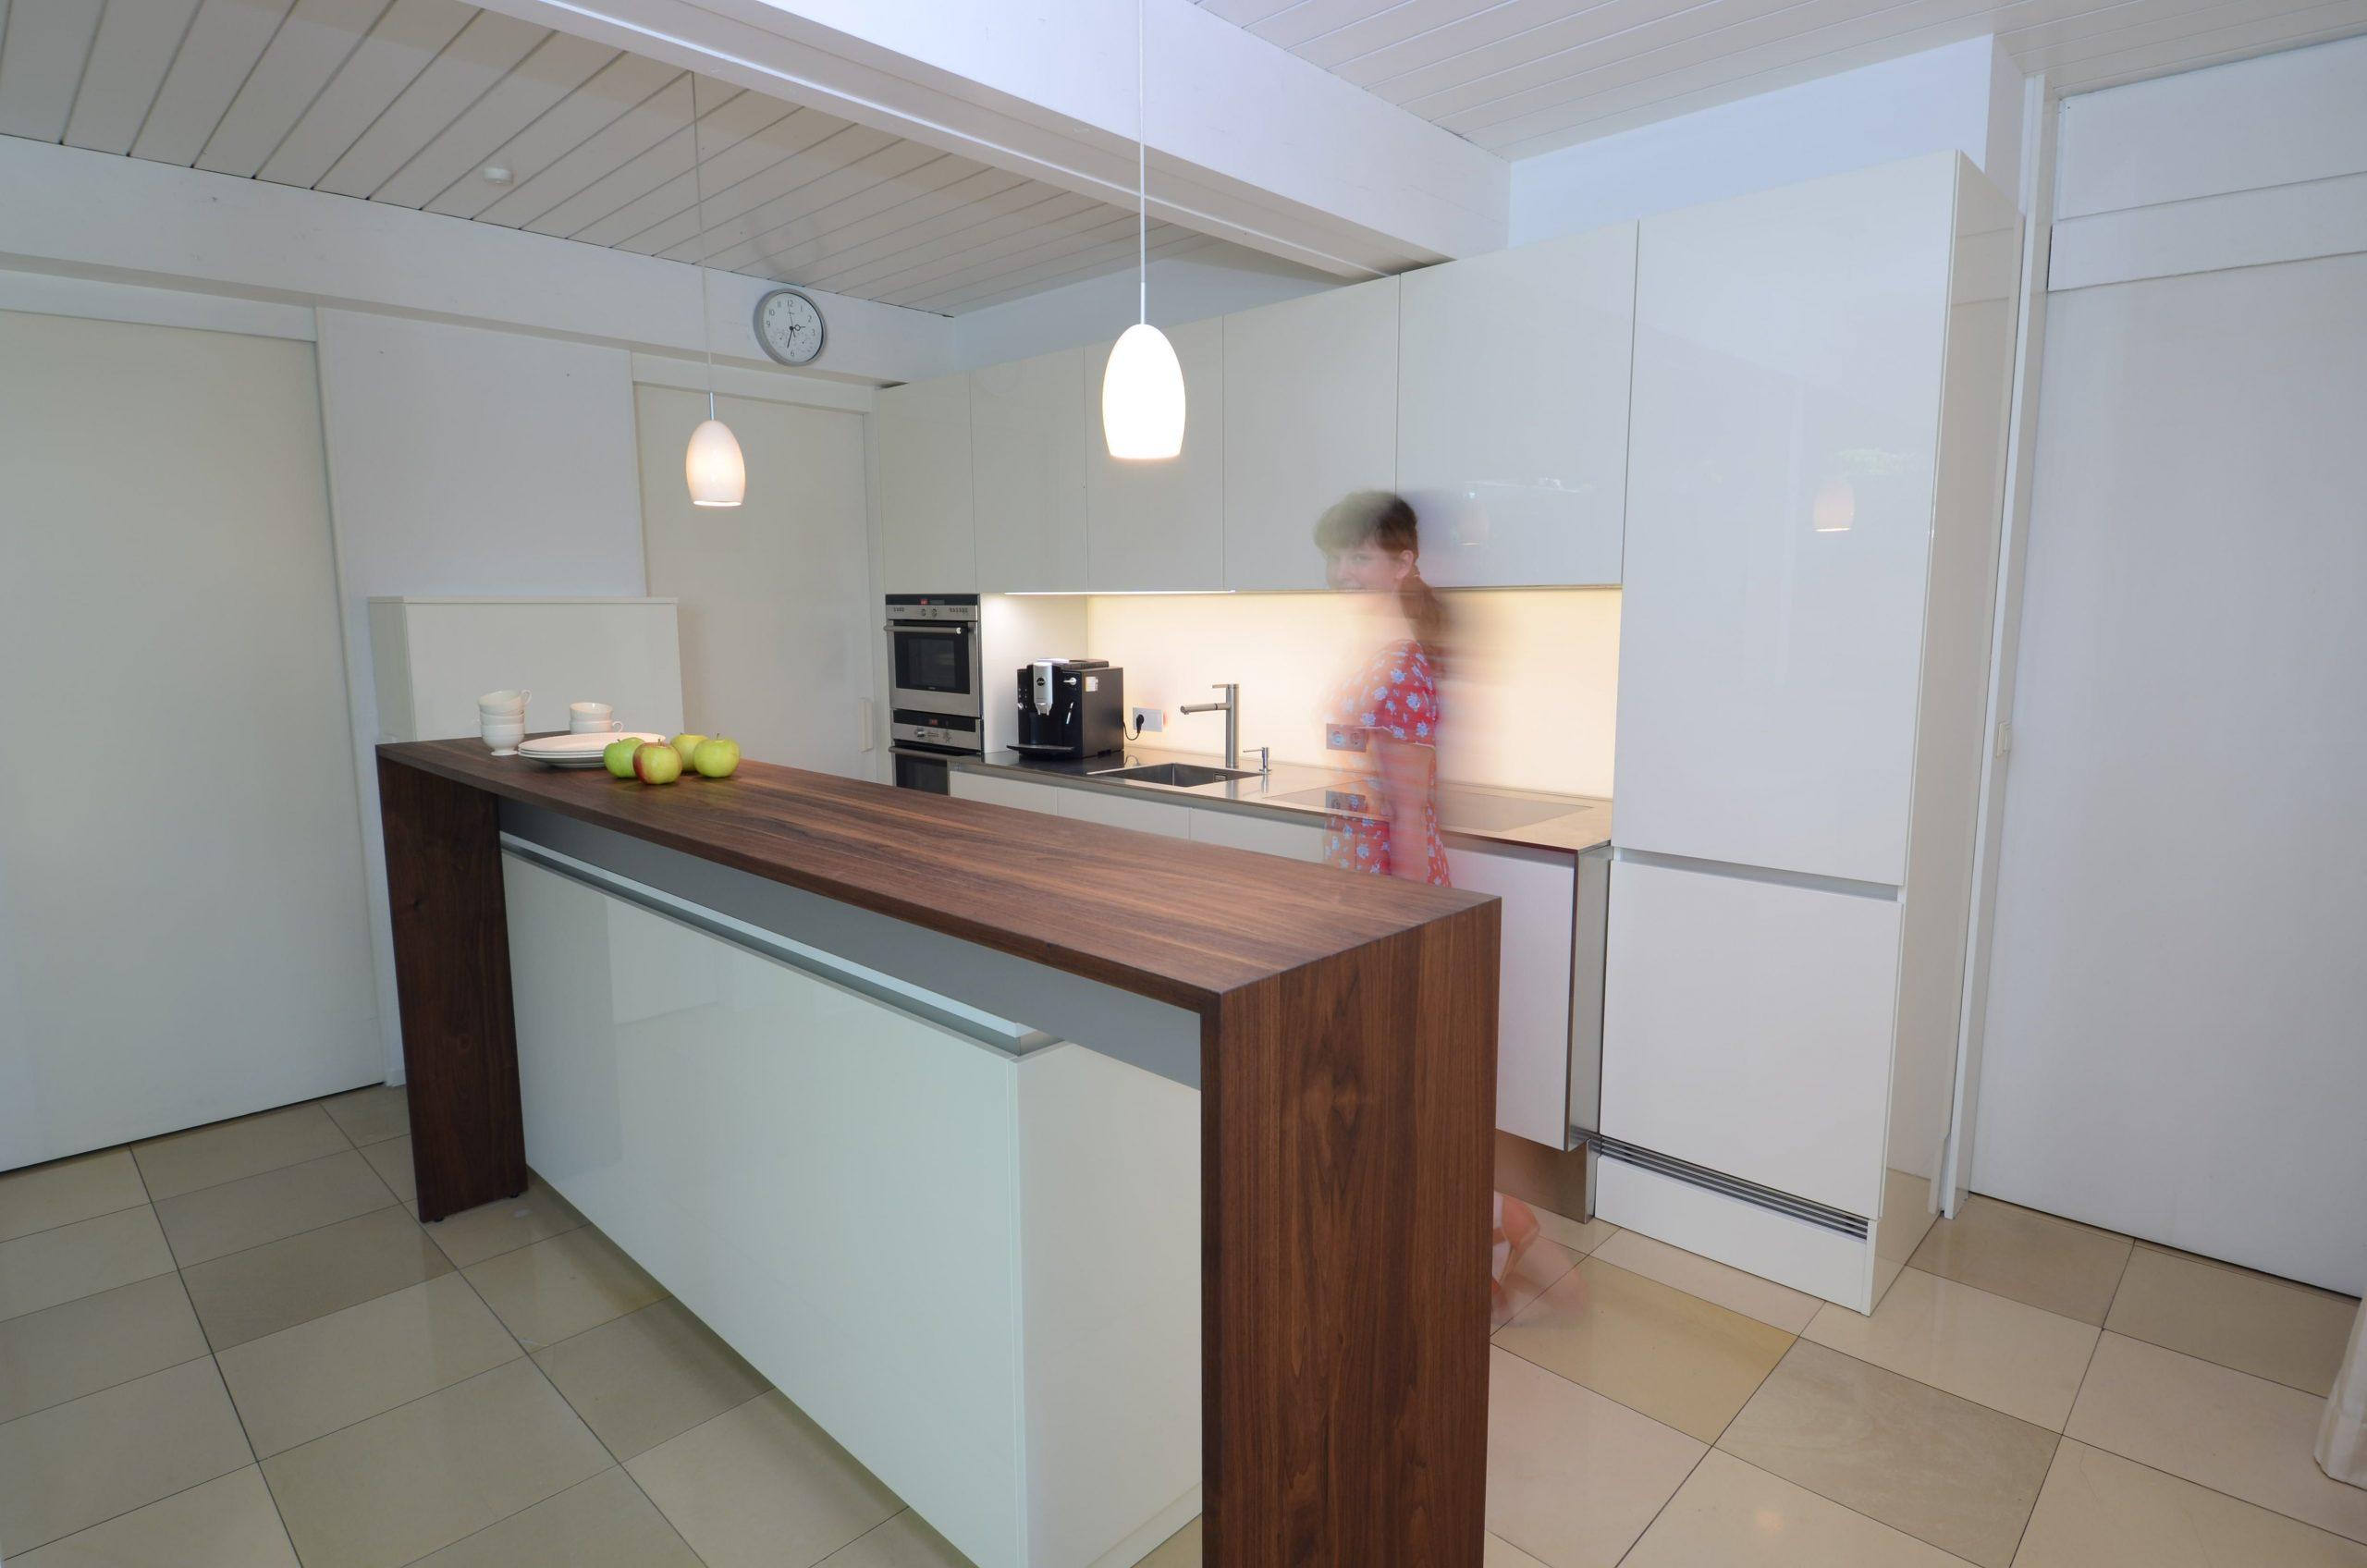 Multifunktional: Küche oder Bar? - Manuela Bross Innenarchitektur